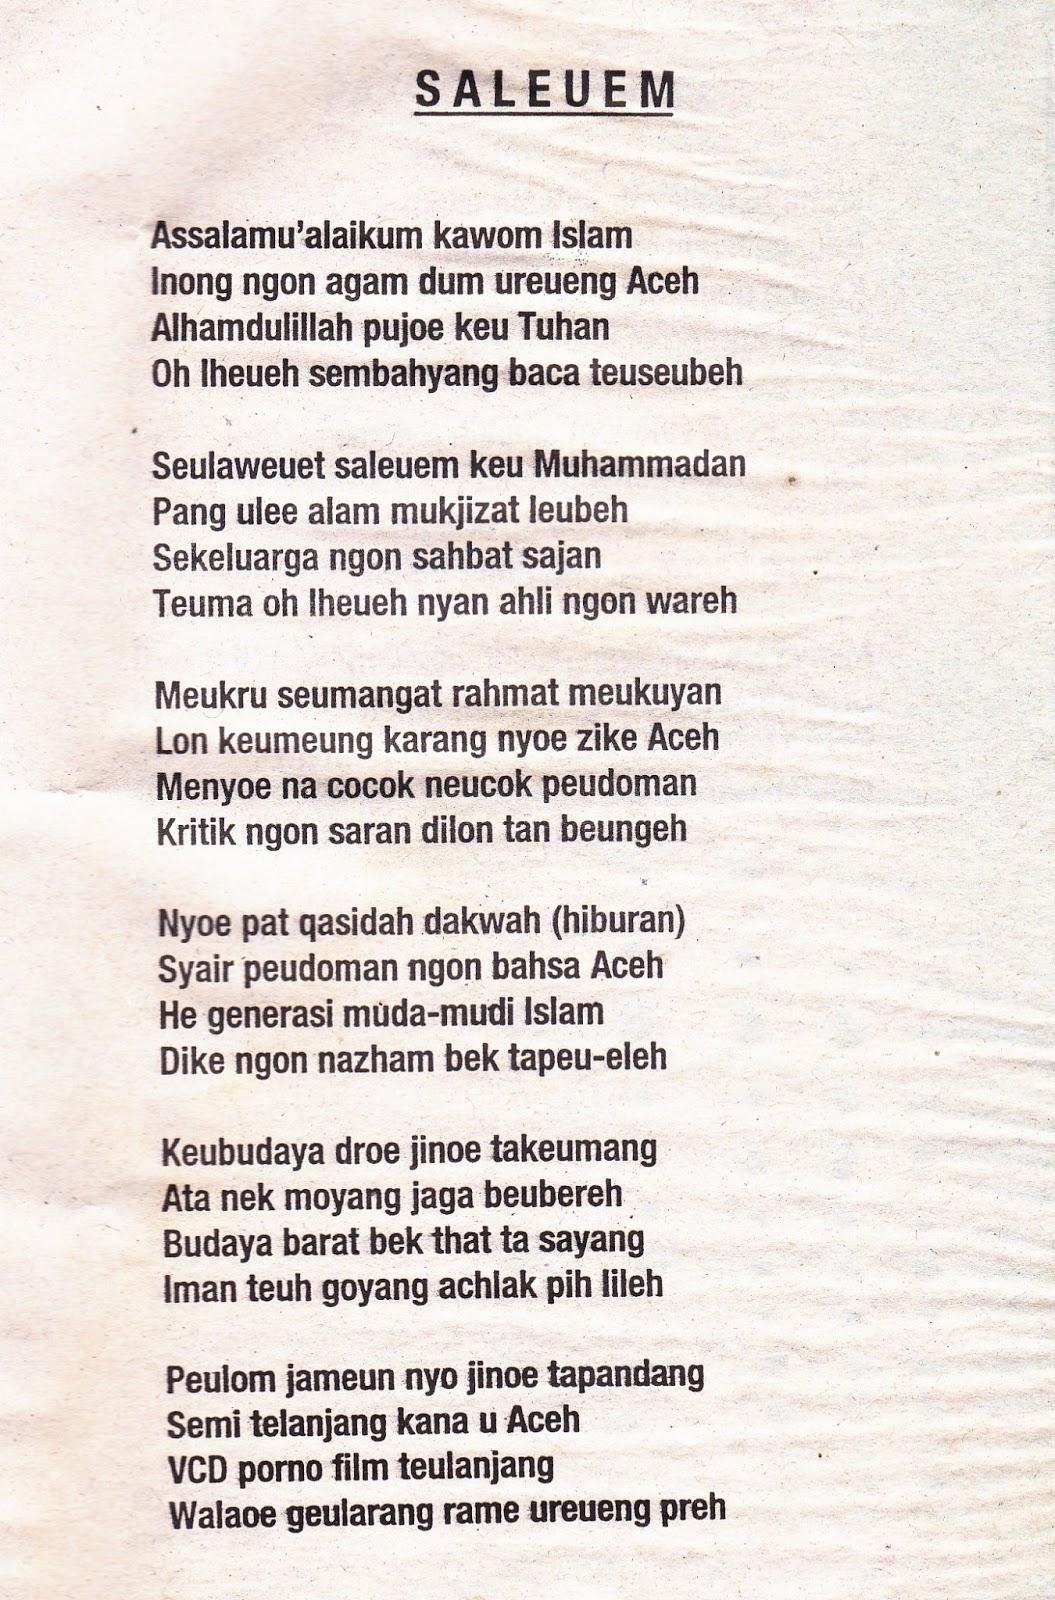 Lirik Lagu Assubhubada : lirik, assubhubada, Lirik, Assubhubada